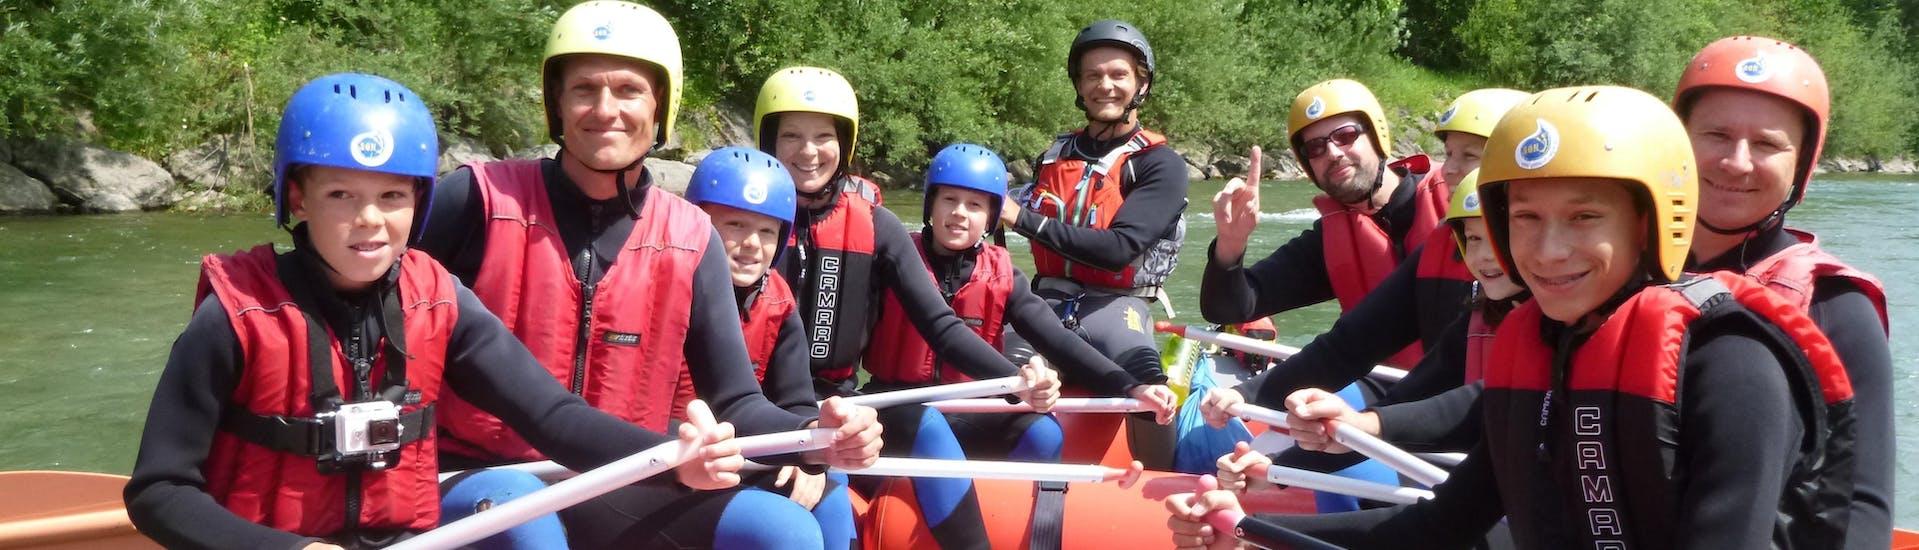 family-rafting---iller-spirits-of-nature-hero